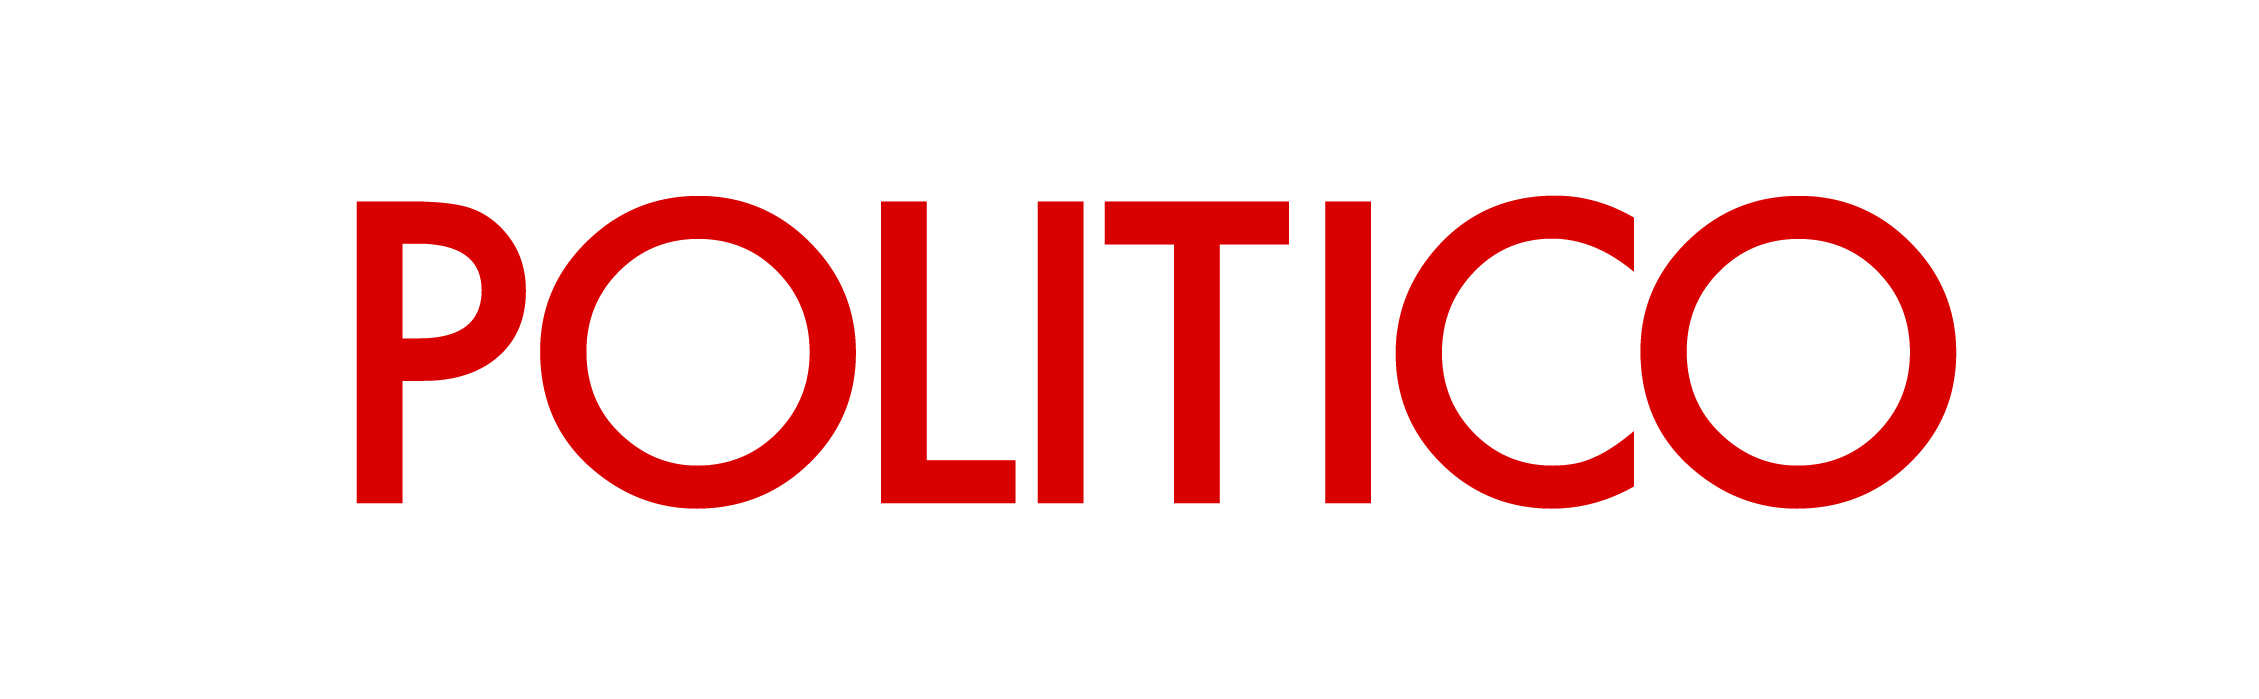 Obama Calls Romney 'Bullshitter,' Politico Headline Hides The Slur